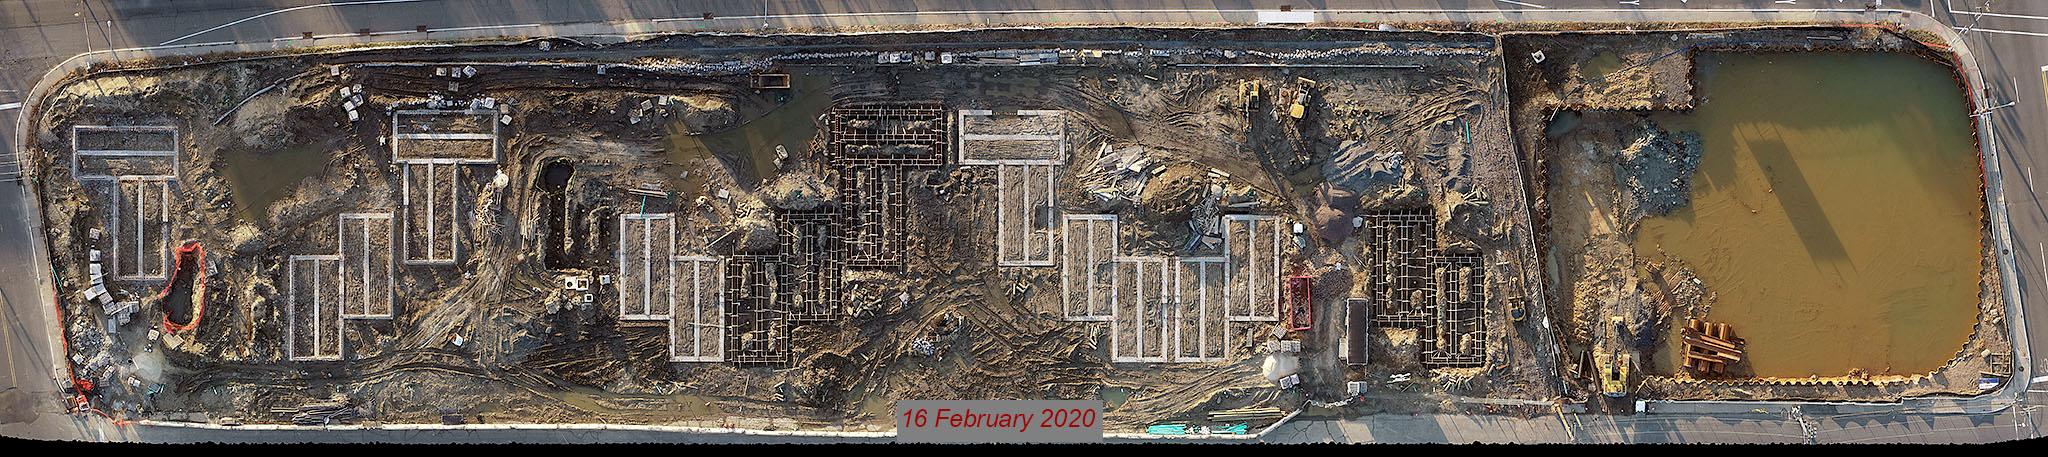 construction progress aerial drone photos